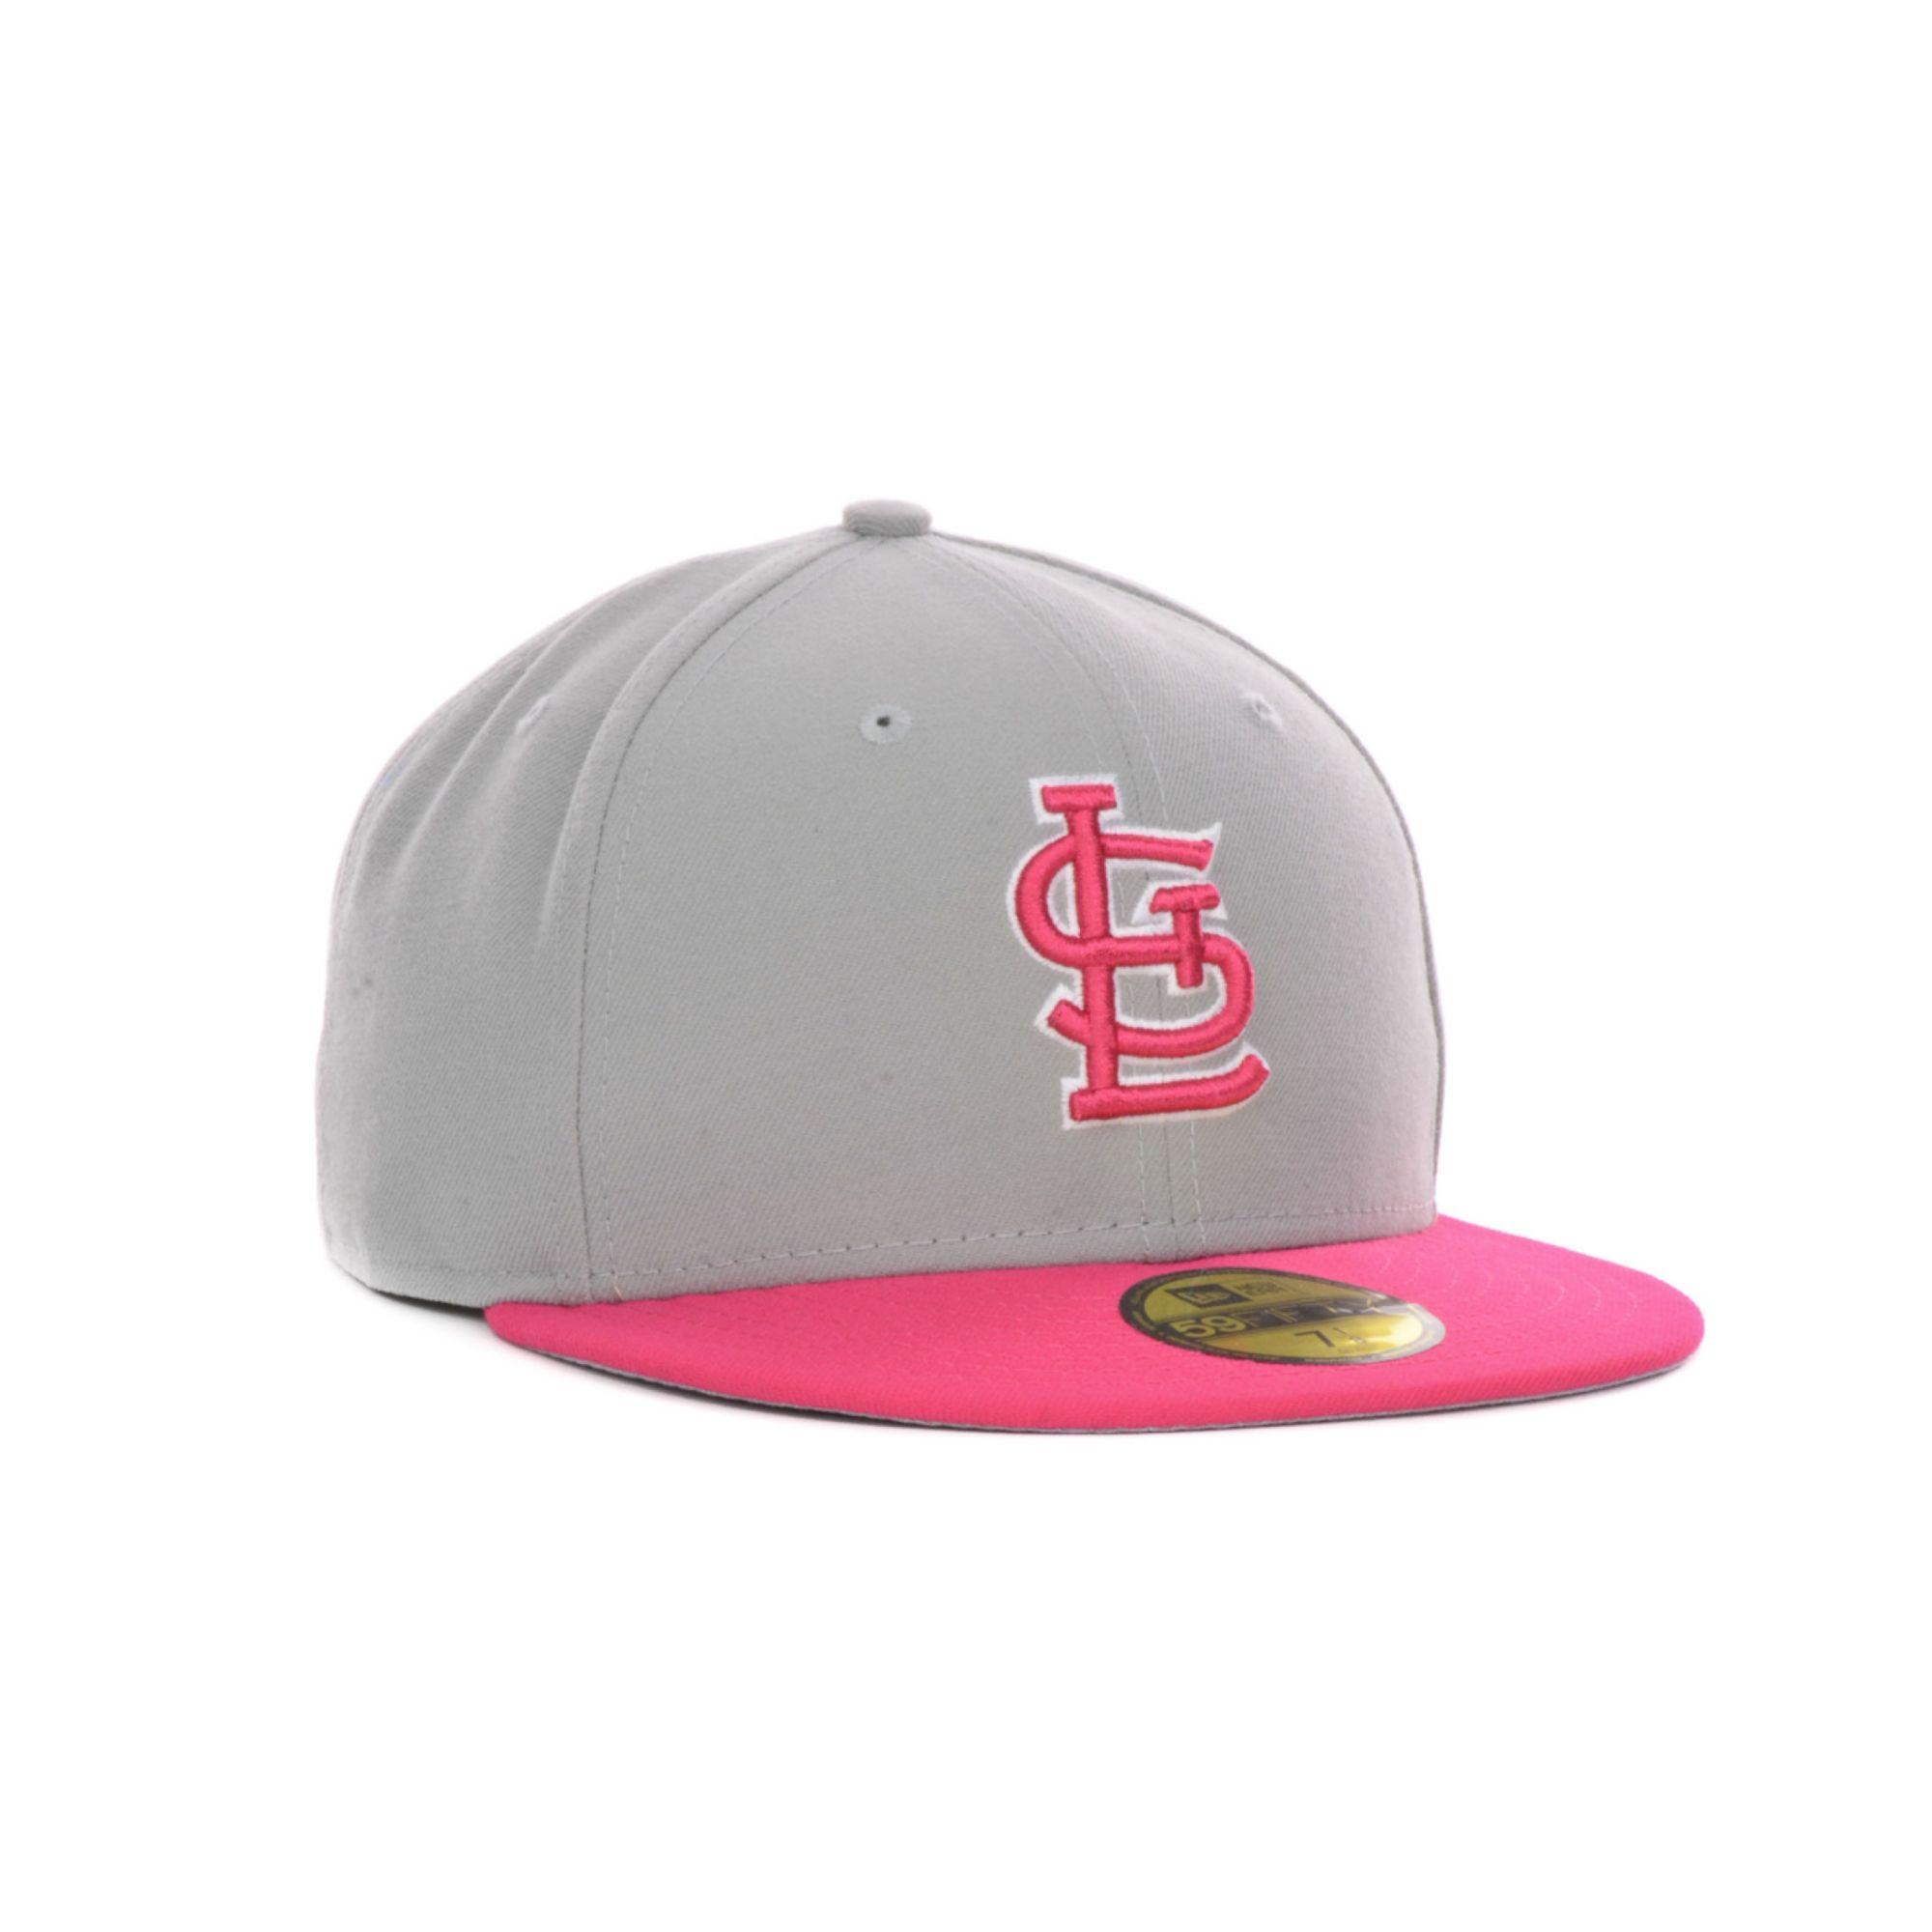 ... new era 2018 stars stripes 4th of july 39thirty flex hat bde46 18179   aliexpress lyst ktz st louis cardinals mlb 2t custom 59fifty cap in pink  for men ... d988f05577fc